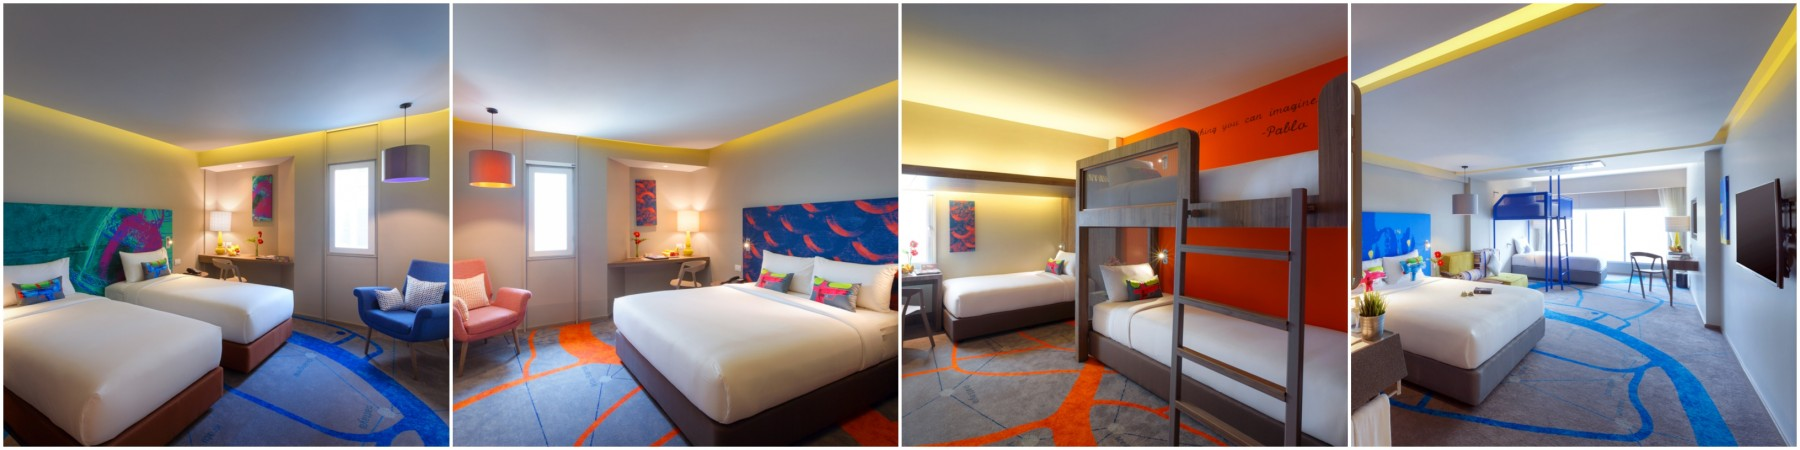 khao san road hotel